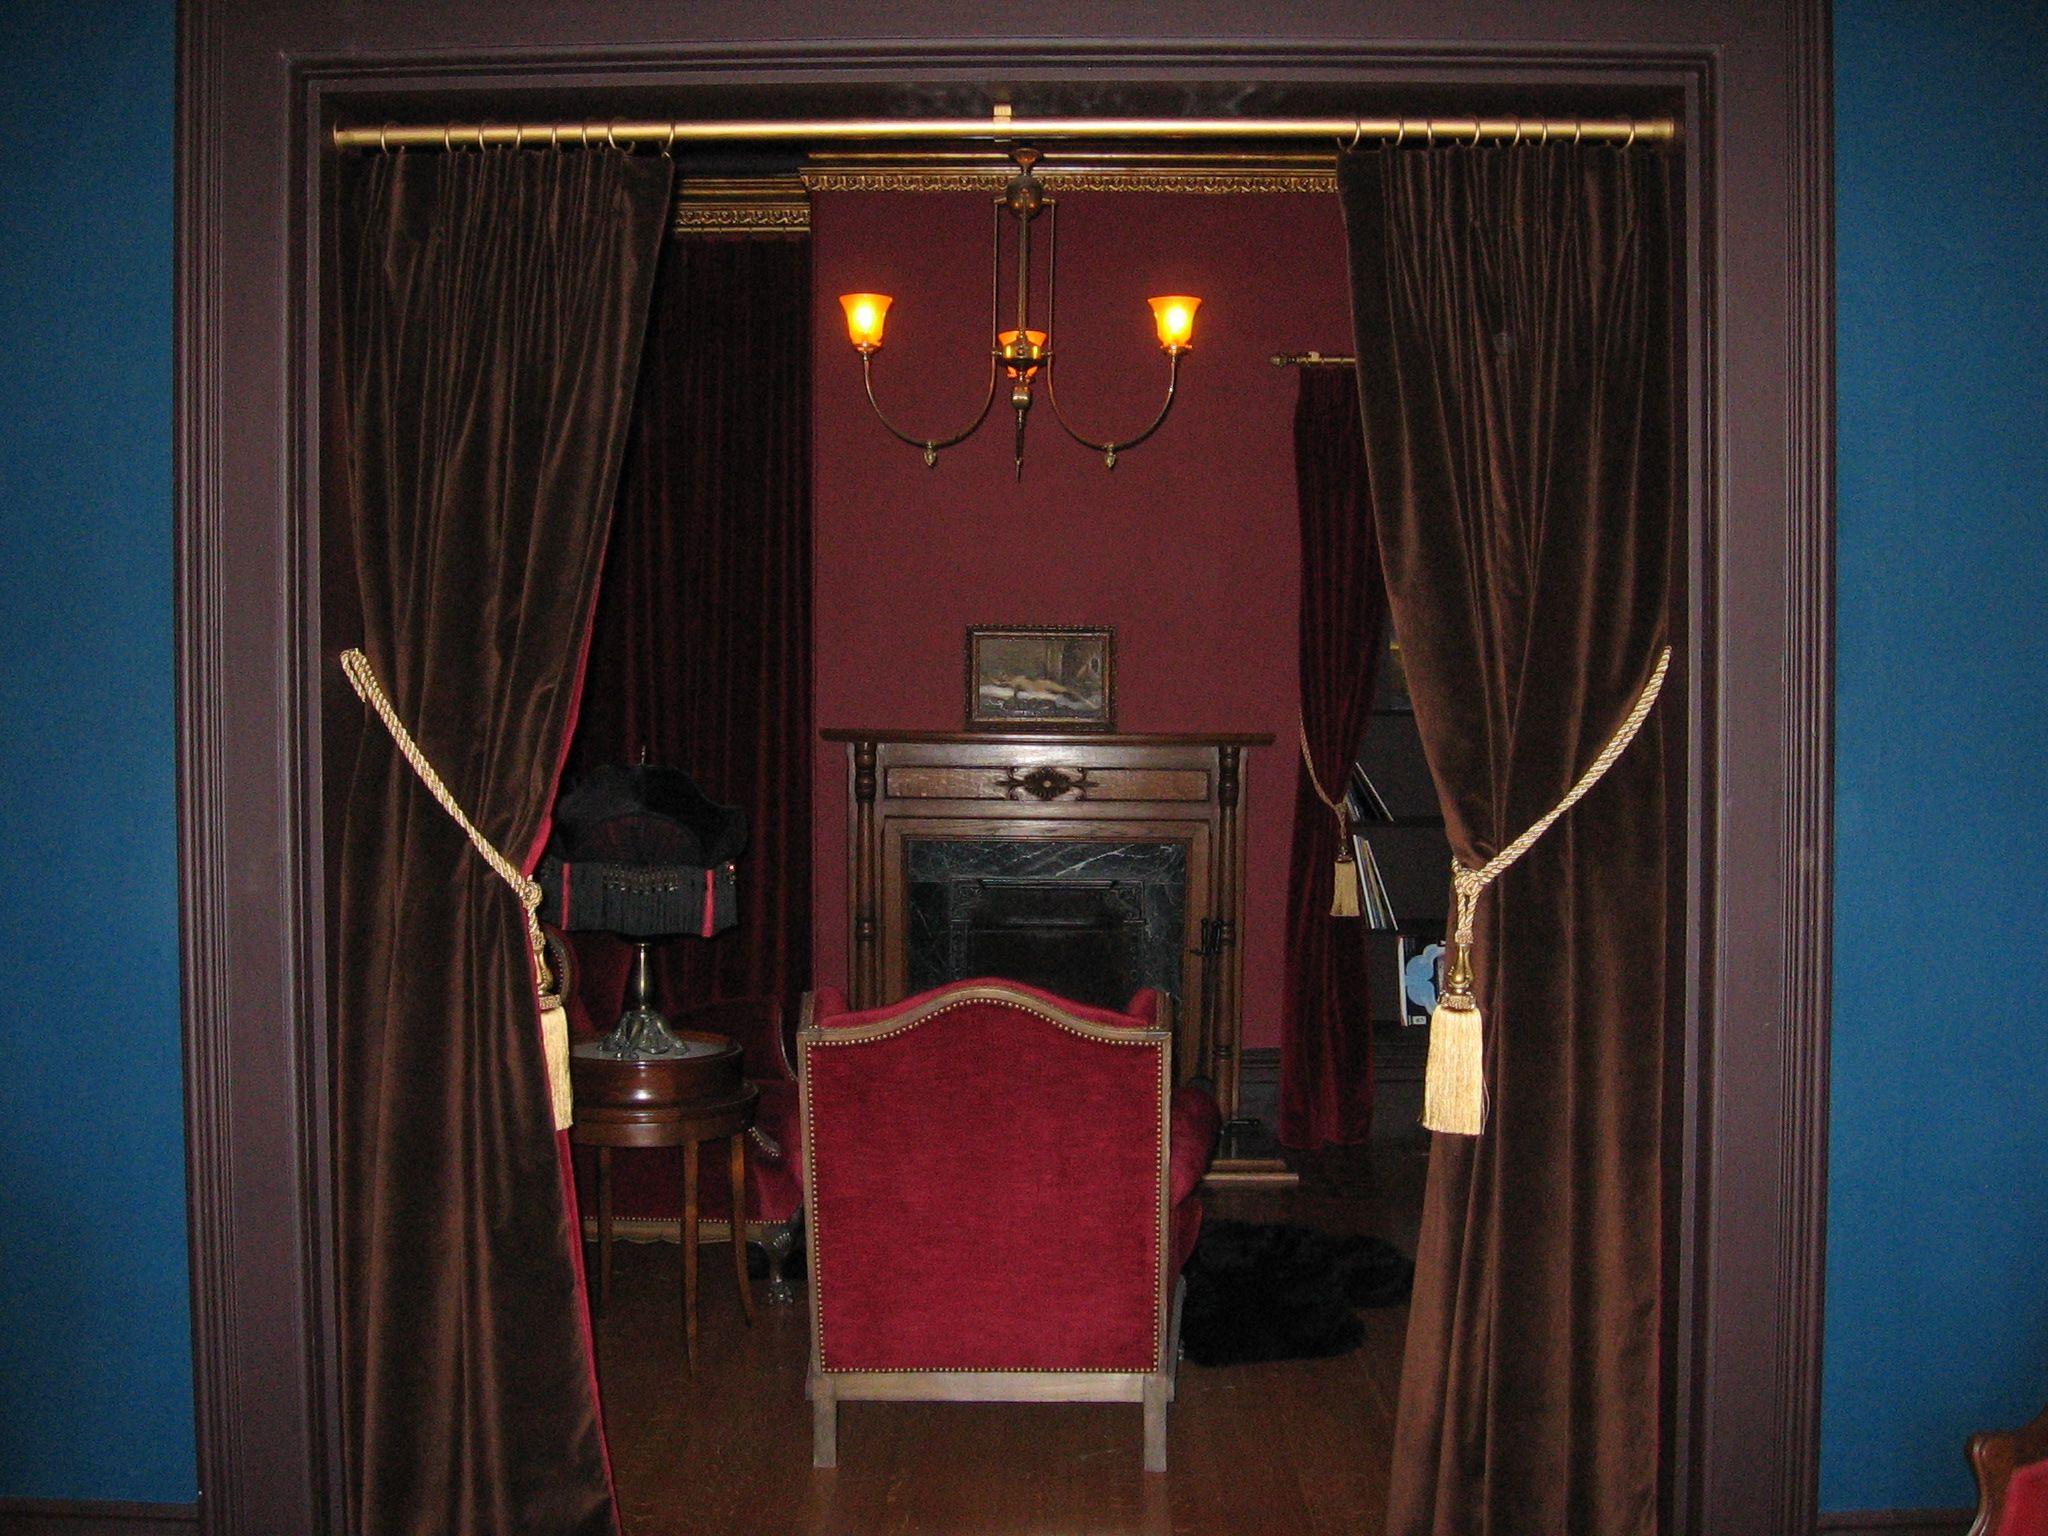 Victorian velvet curtains - Two Sided Velvet Drapes Different Colors On Each Side Gold Tassel Tiebacks And Gold